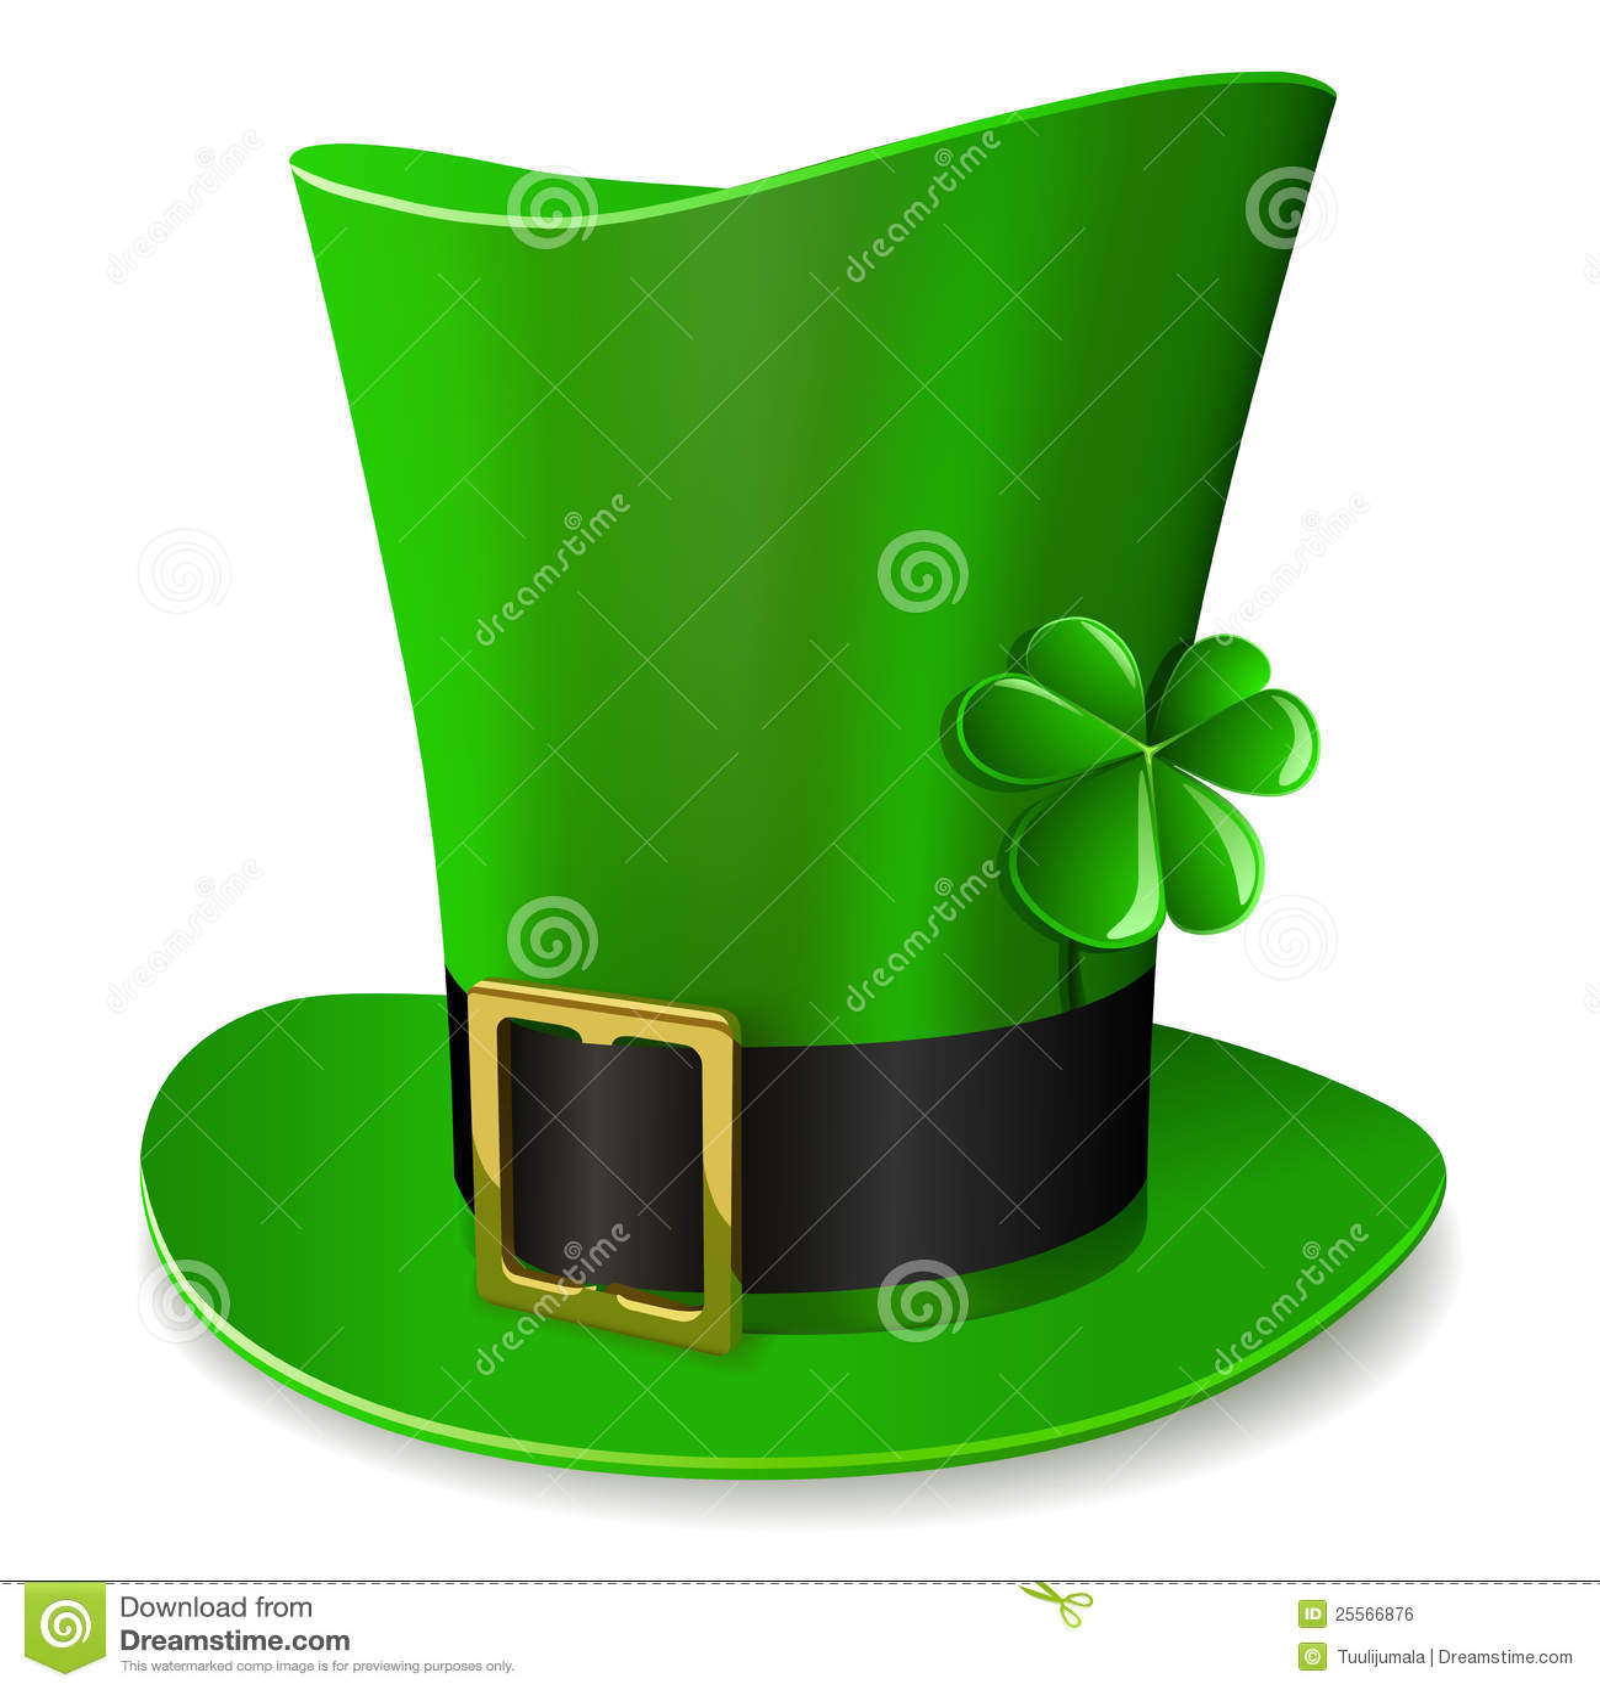 Leprechaun hat - St. Patrick's Day symbol.